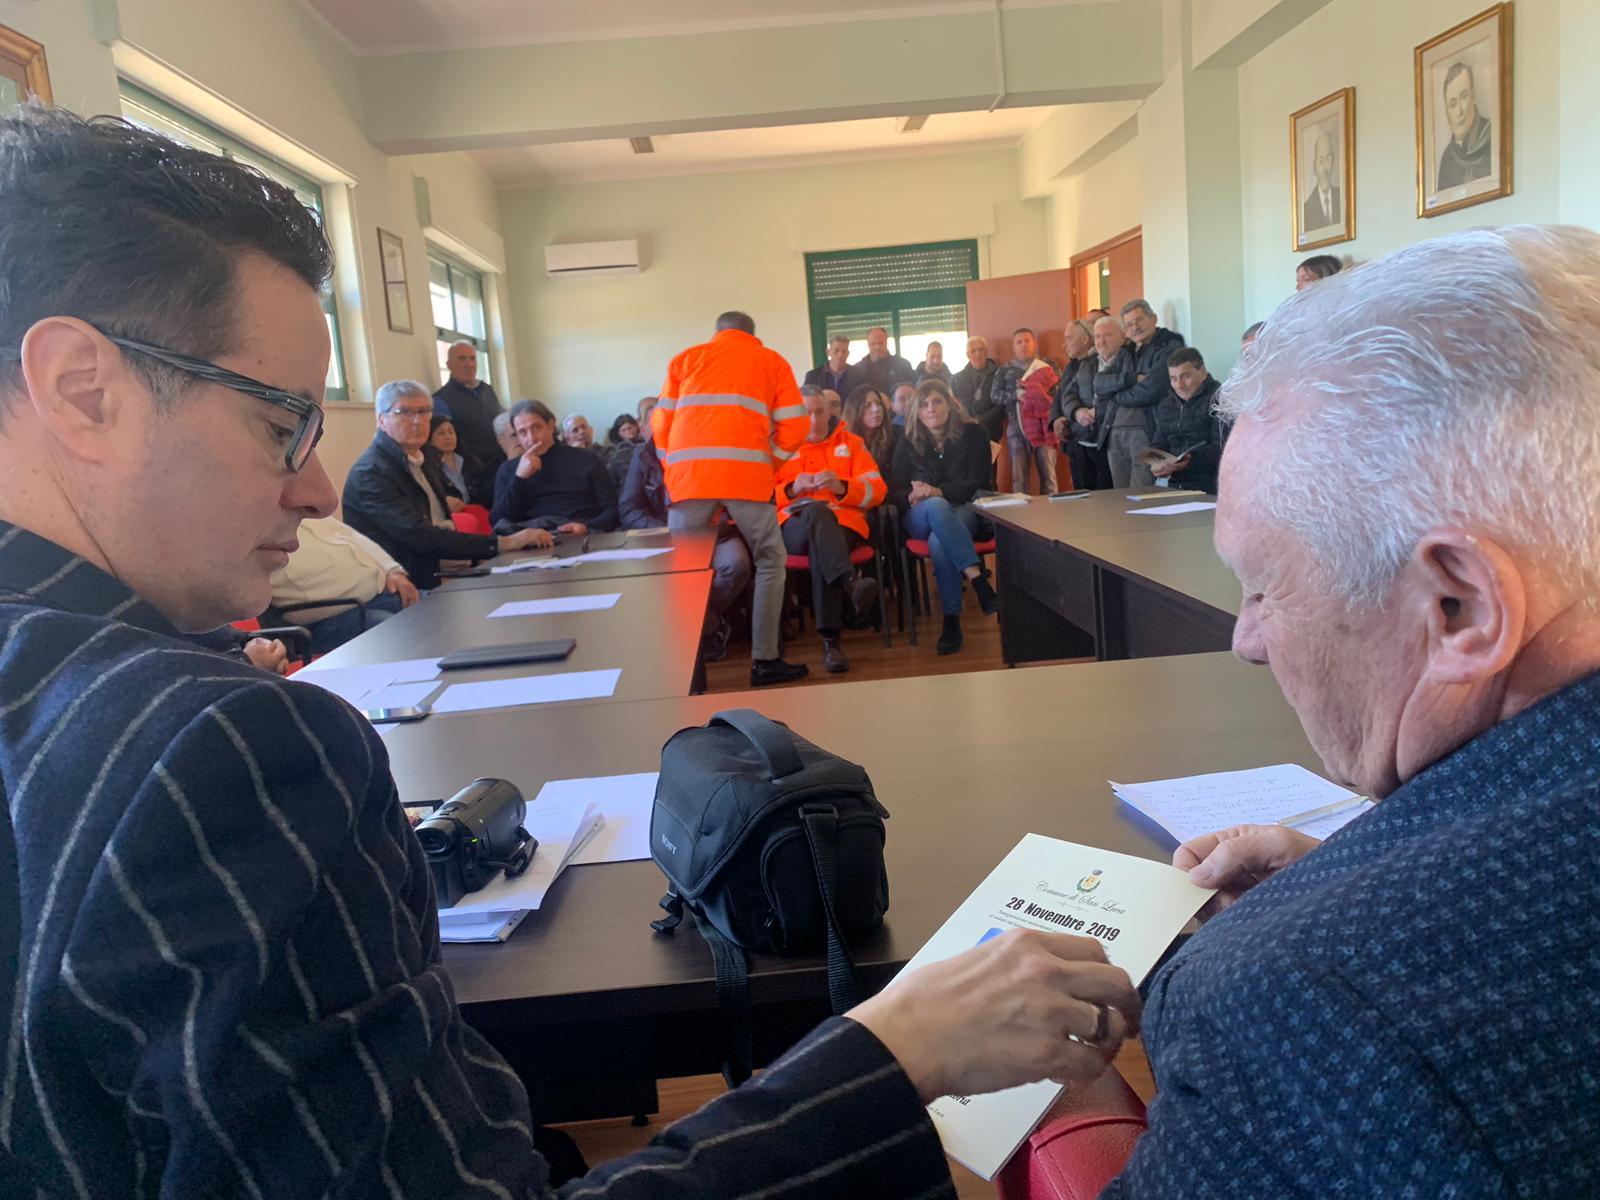 Lavoro, i sindacati a San Luca. Il plauso di Klaus Davi